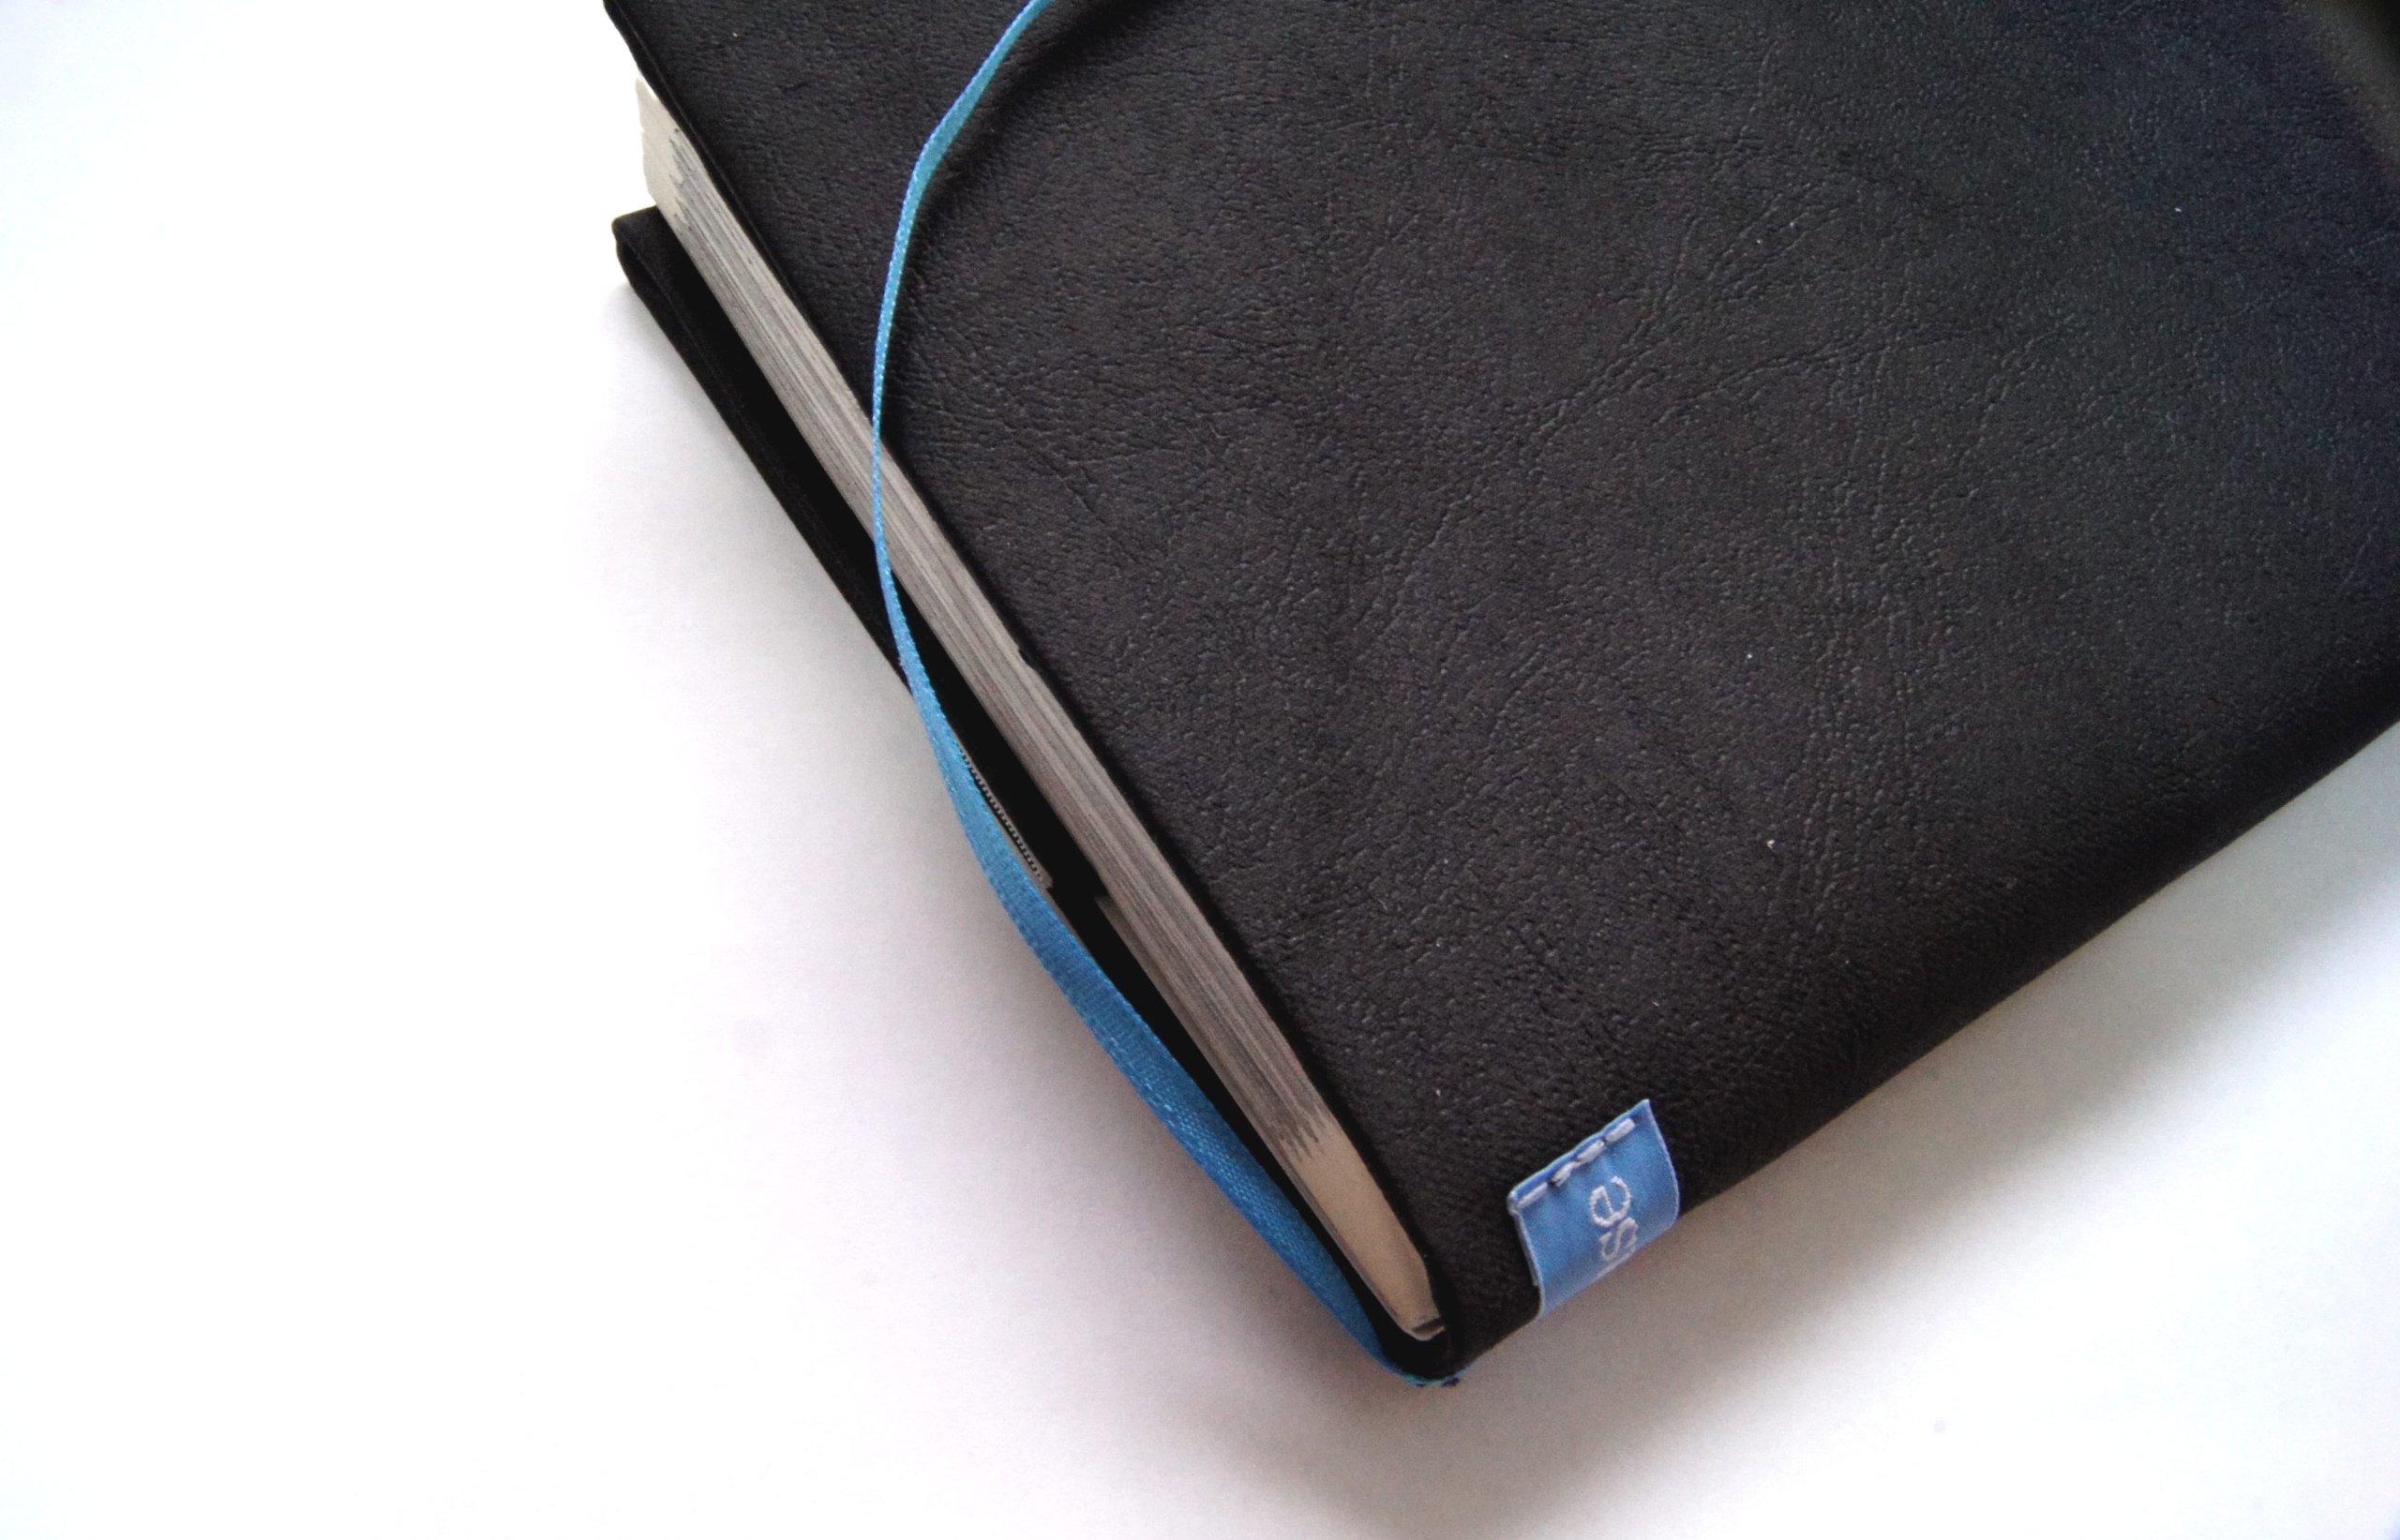 Beahouse フリーサイズブックカバーレザリッシュ~ほぼ全サイズ対応 (文庫、B6、四六、新書、A5、マンガ、ノート) (ブラック)